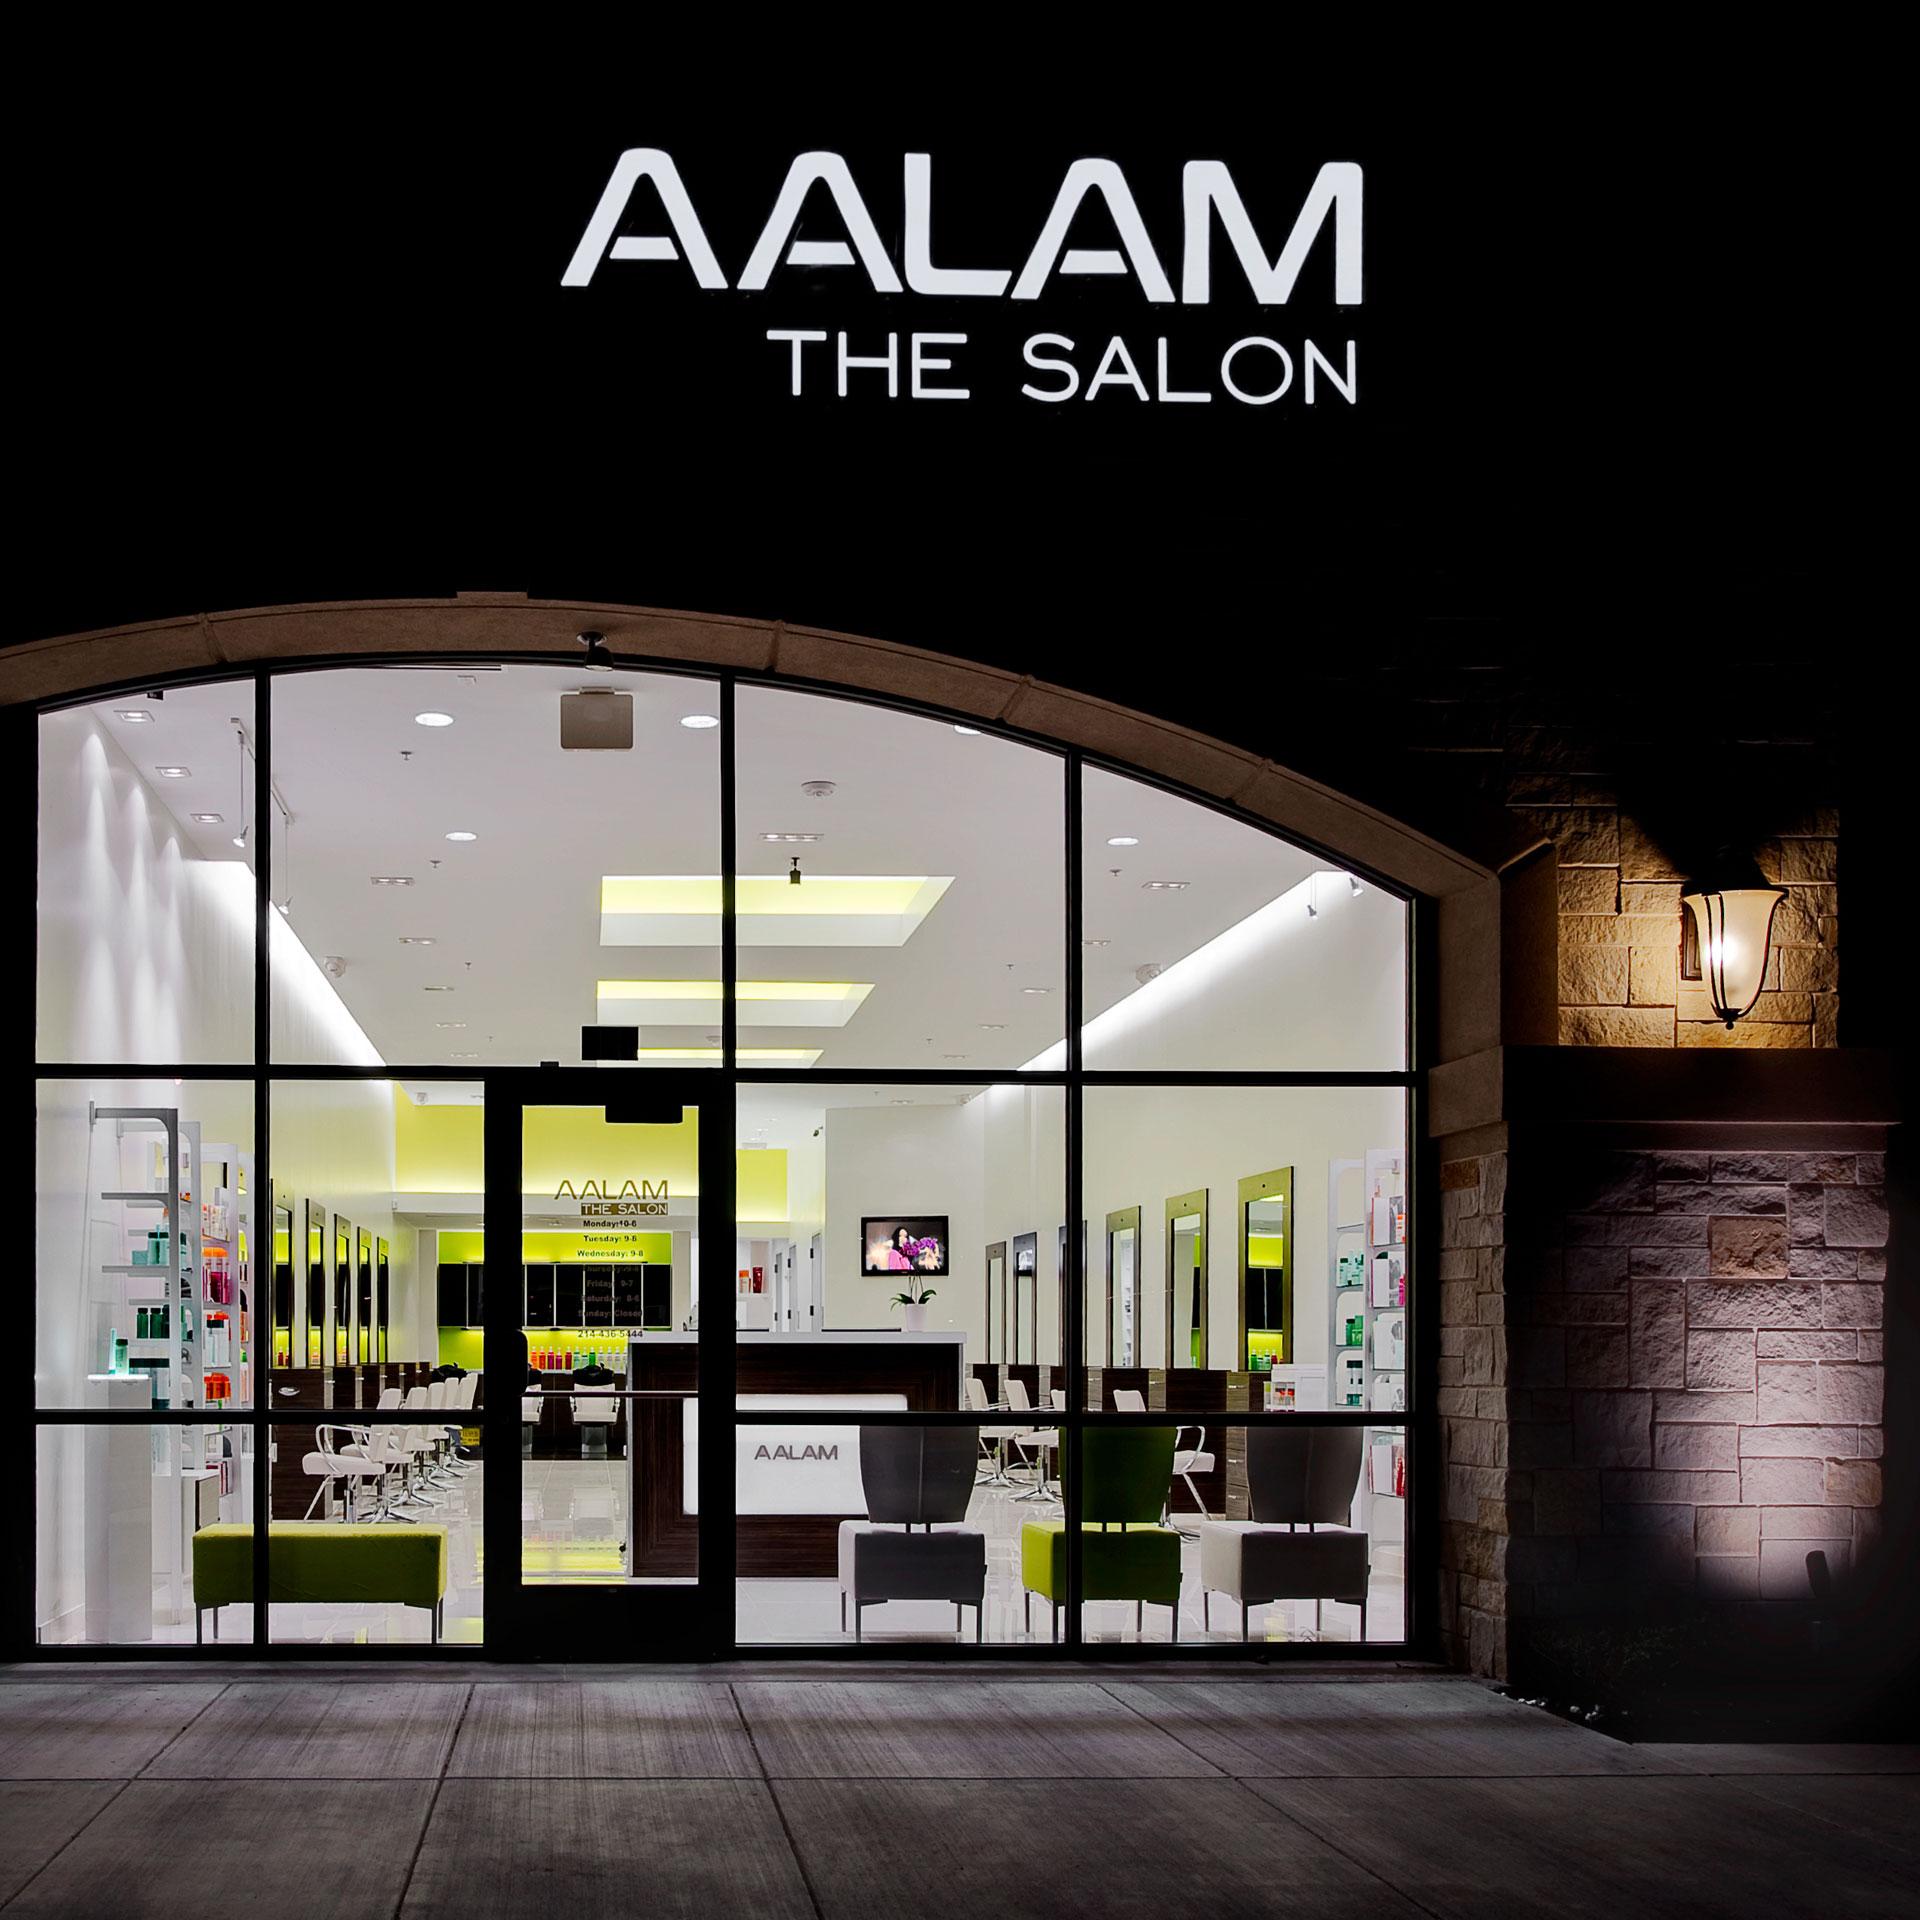 AALAM The Salon Plano Texas Top Hair salon for Men Women Upscale Hair salon High End Hair Salon Plano TX Haircut Hair Color High Lights Hair Colorist Hair Stylist Balayage 1